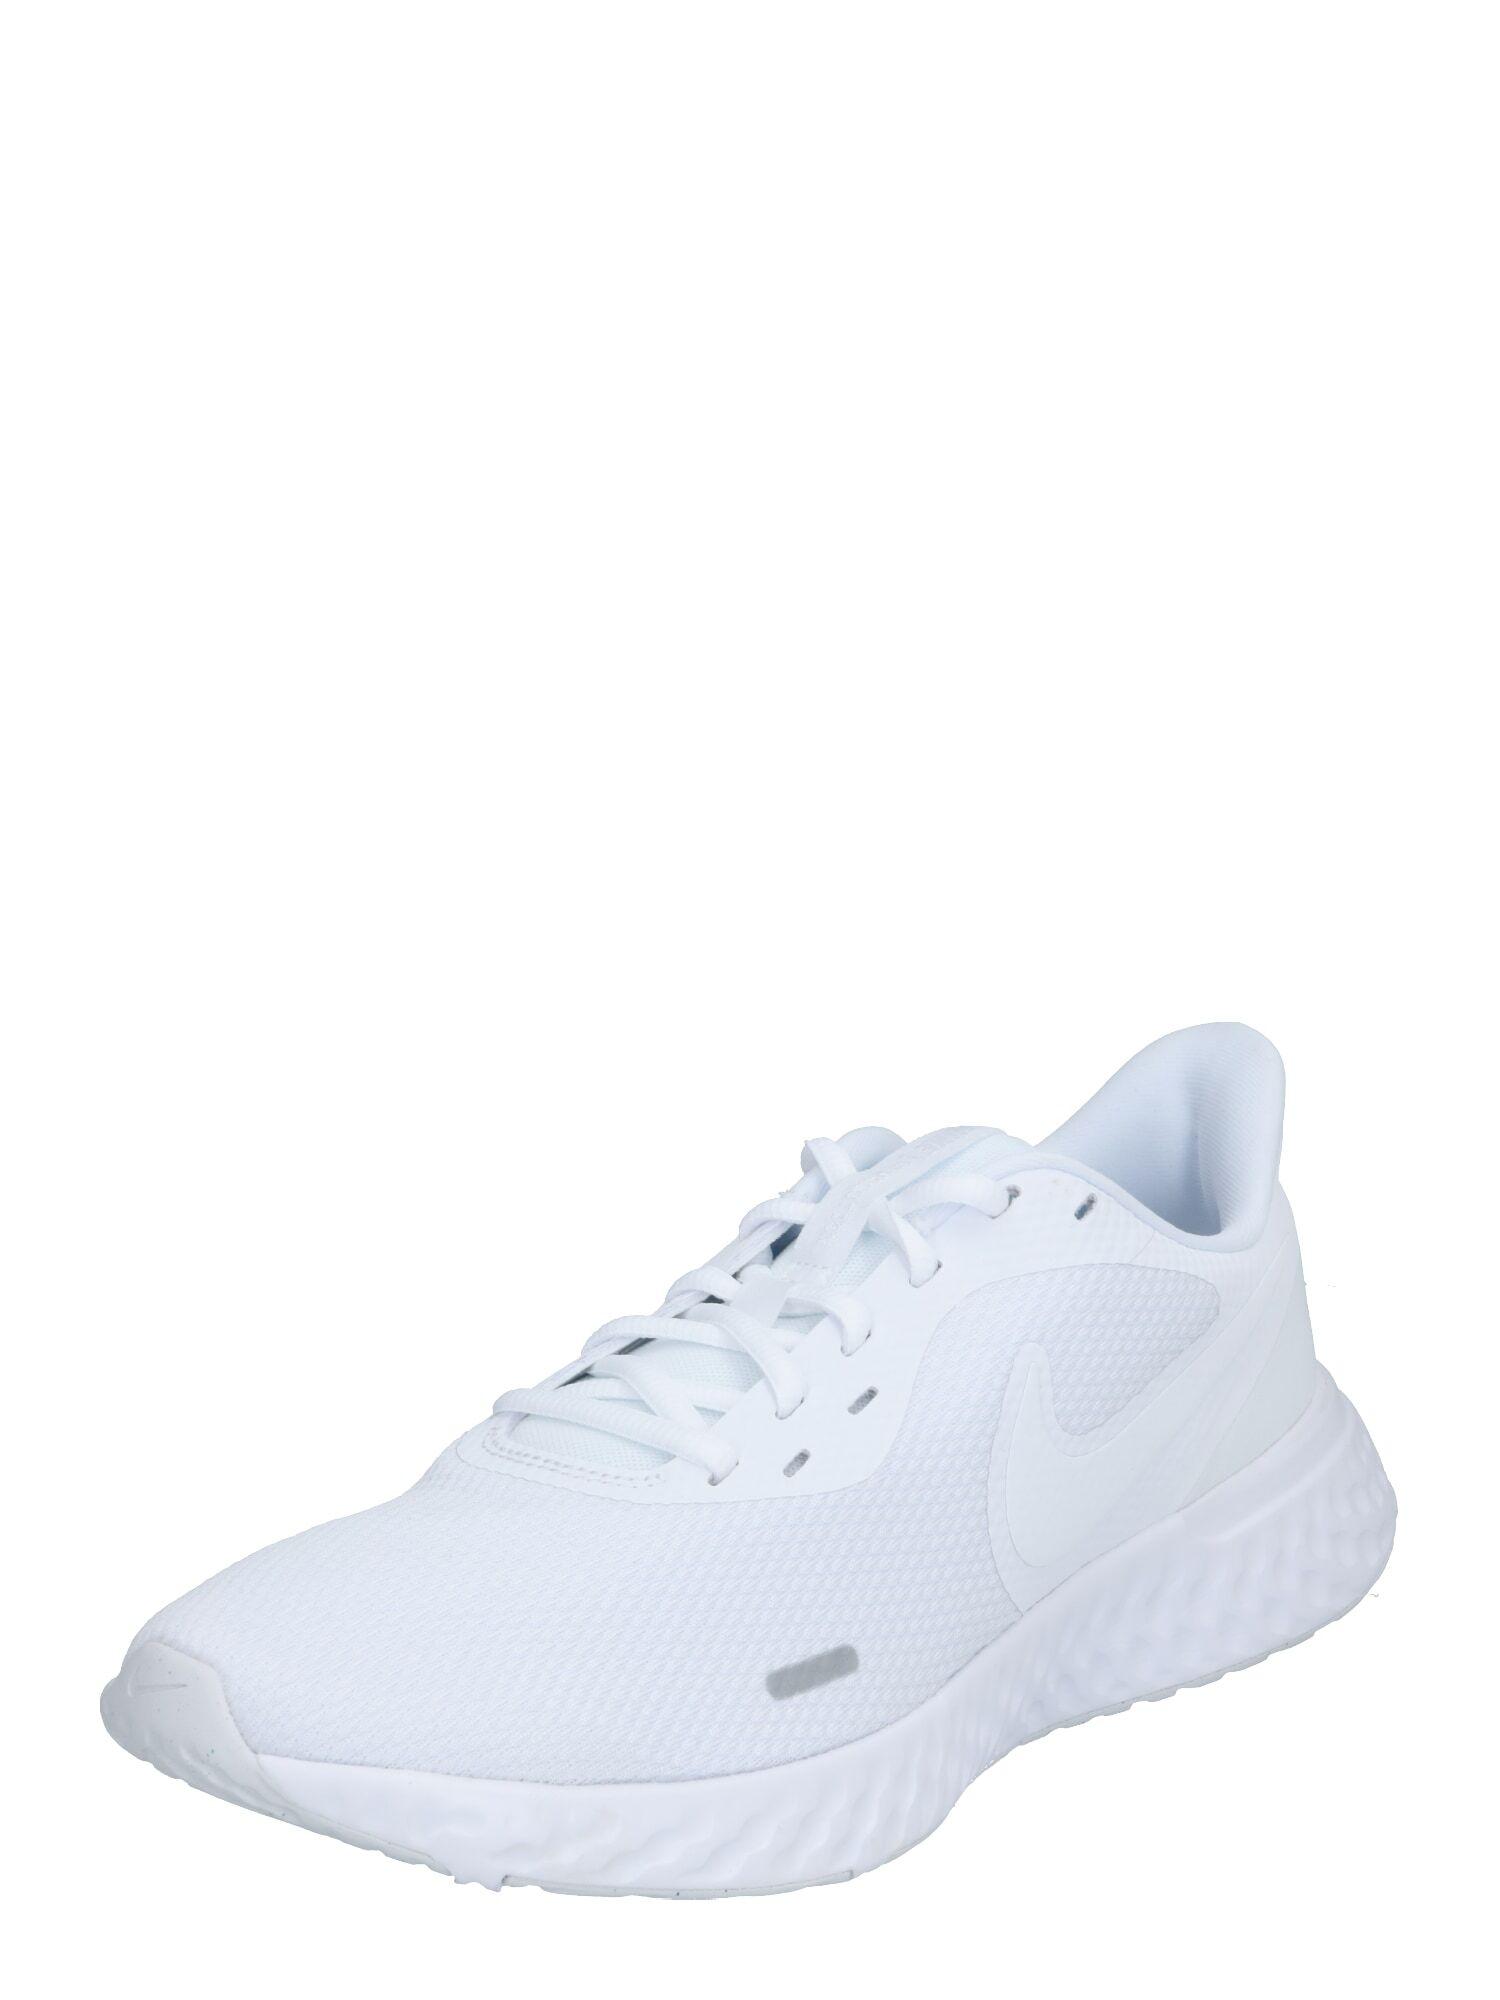 NIKE Chaussure de course 'Revolution 5'  - Blanc - Taille: 11 - male